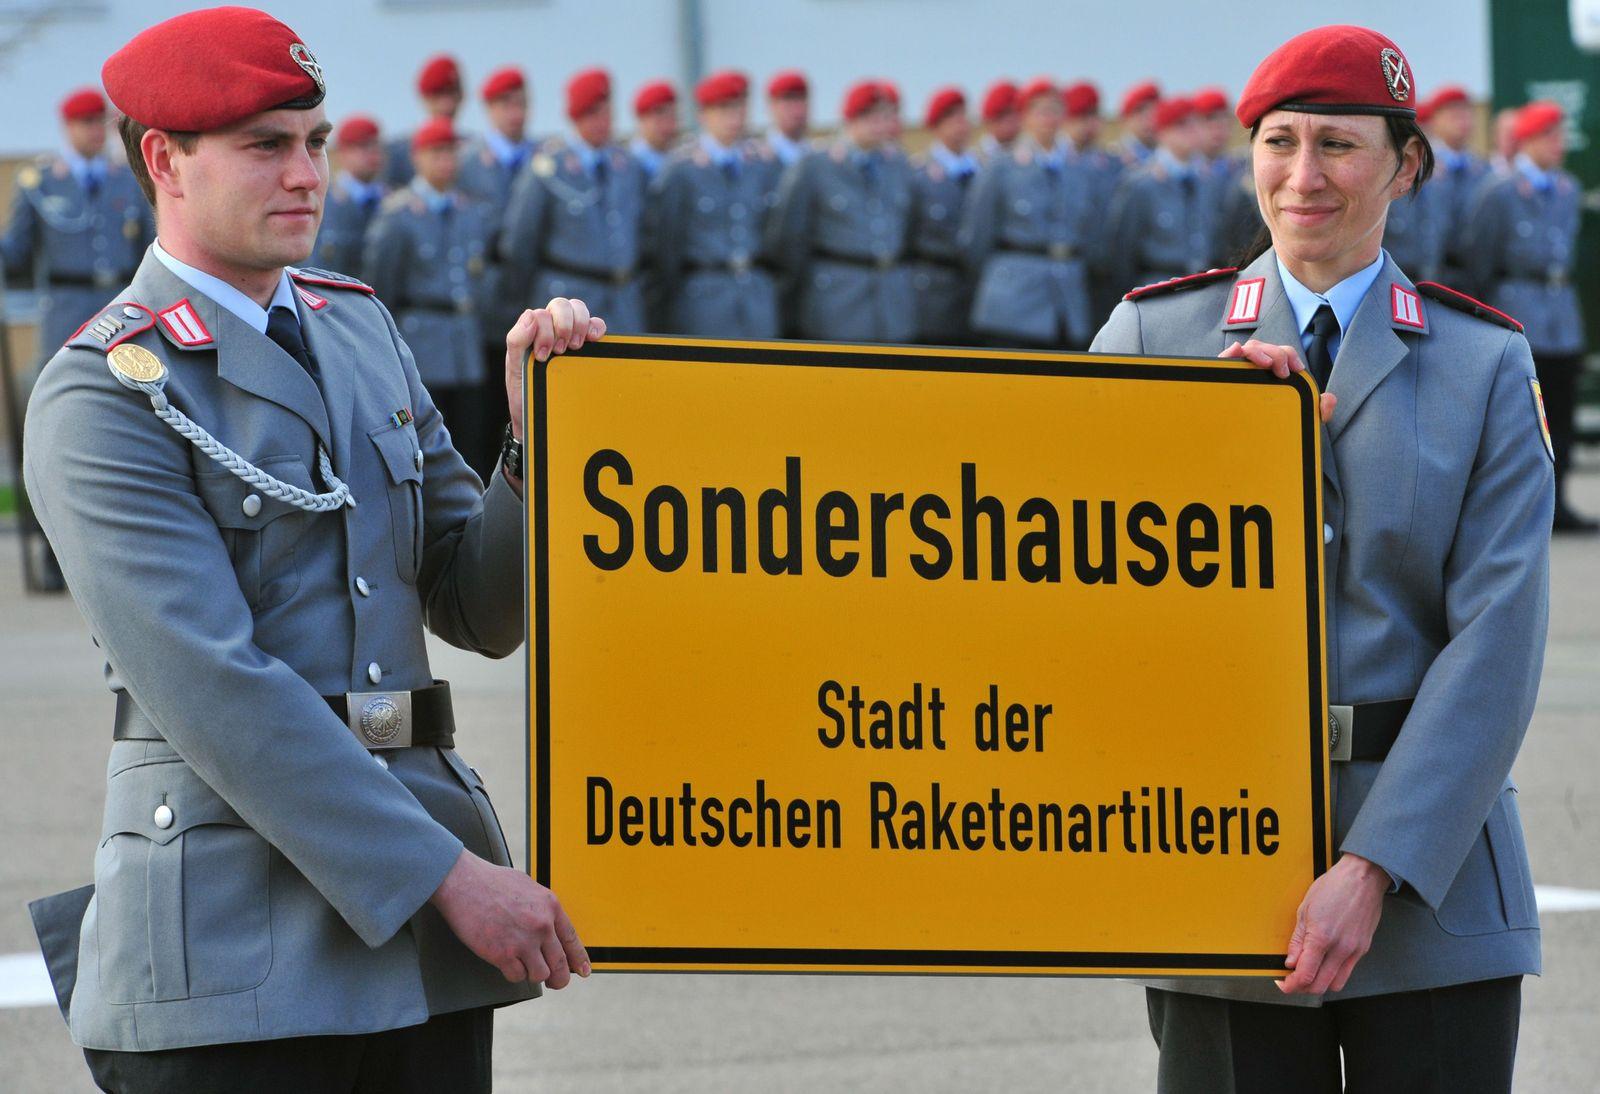 Bundeswehr / Sondershausen